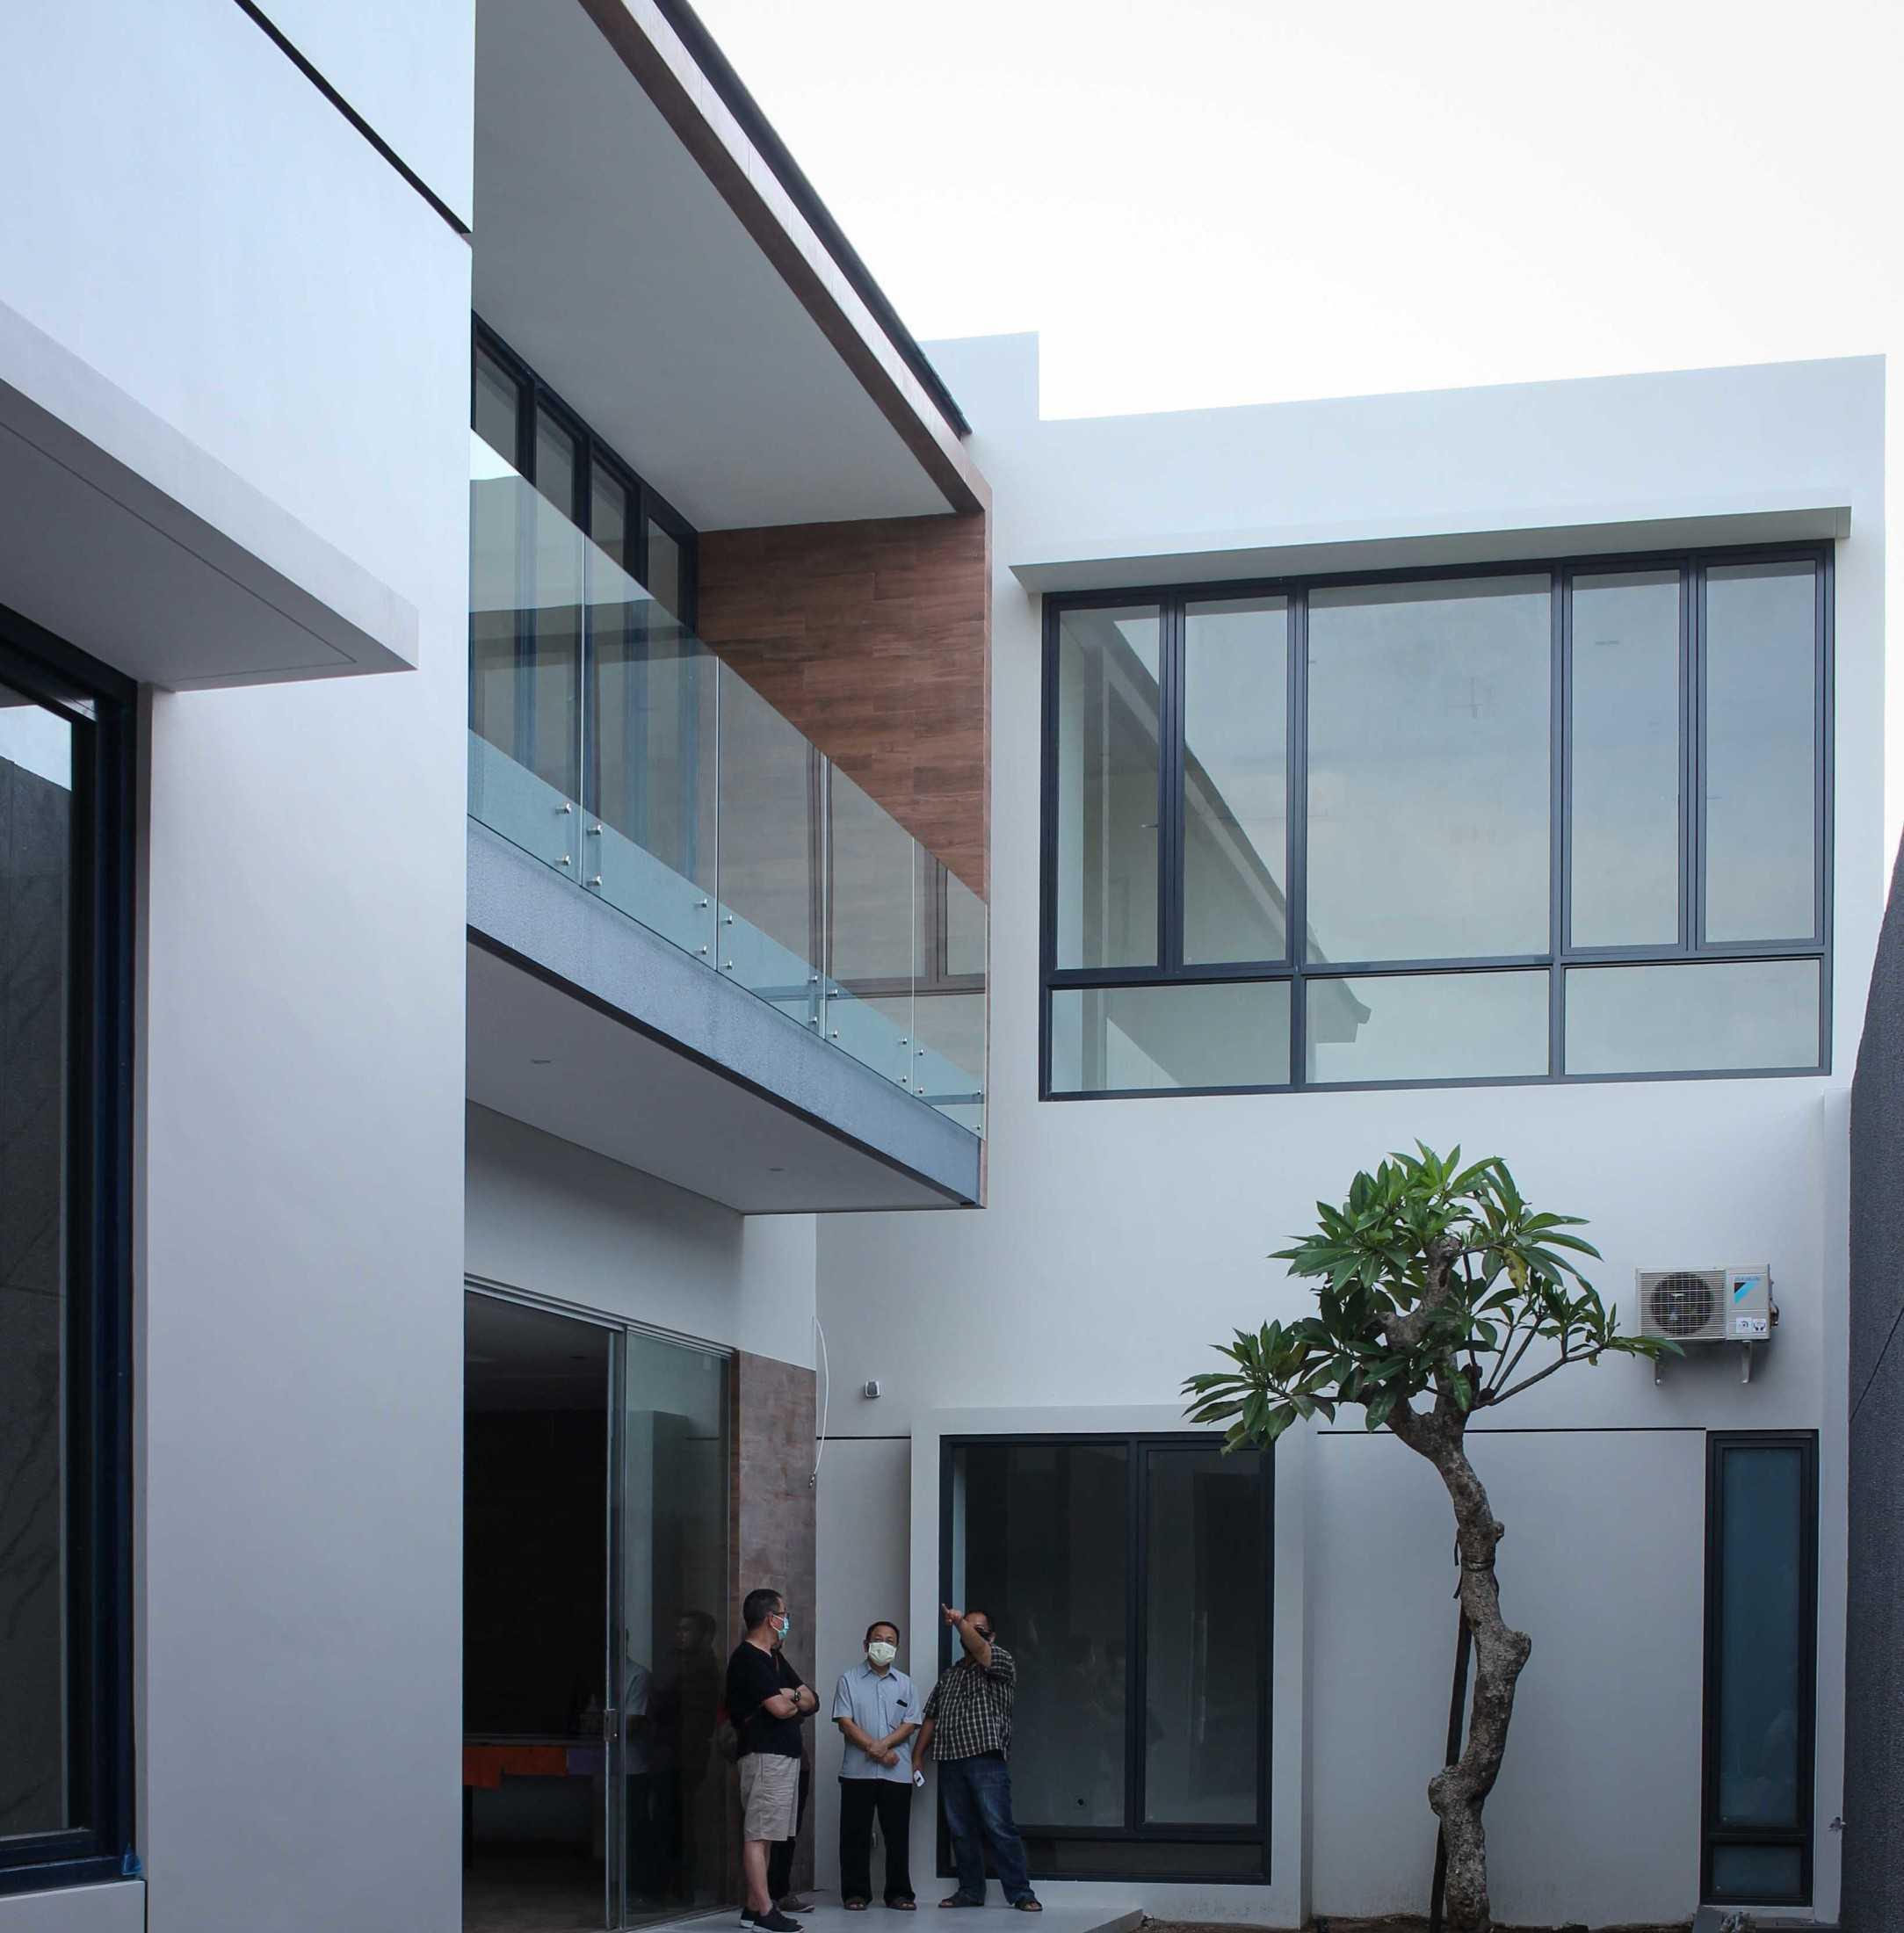 Y0 Design Architect S House Kec. Srono, Kabupaten Banyuwangi, Jawa Timur, Indonesia Kec. Srono, Kabupaten Banyuwangi, Jawa Timur, Indonesia Yohanes-Iswara-Limandjaya-S-House  121084